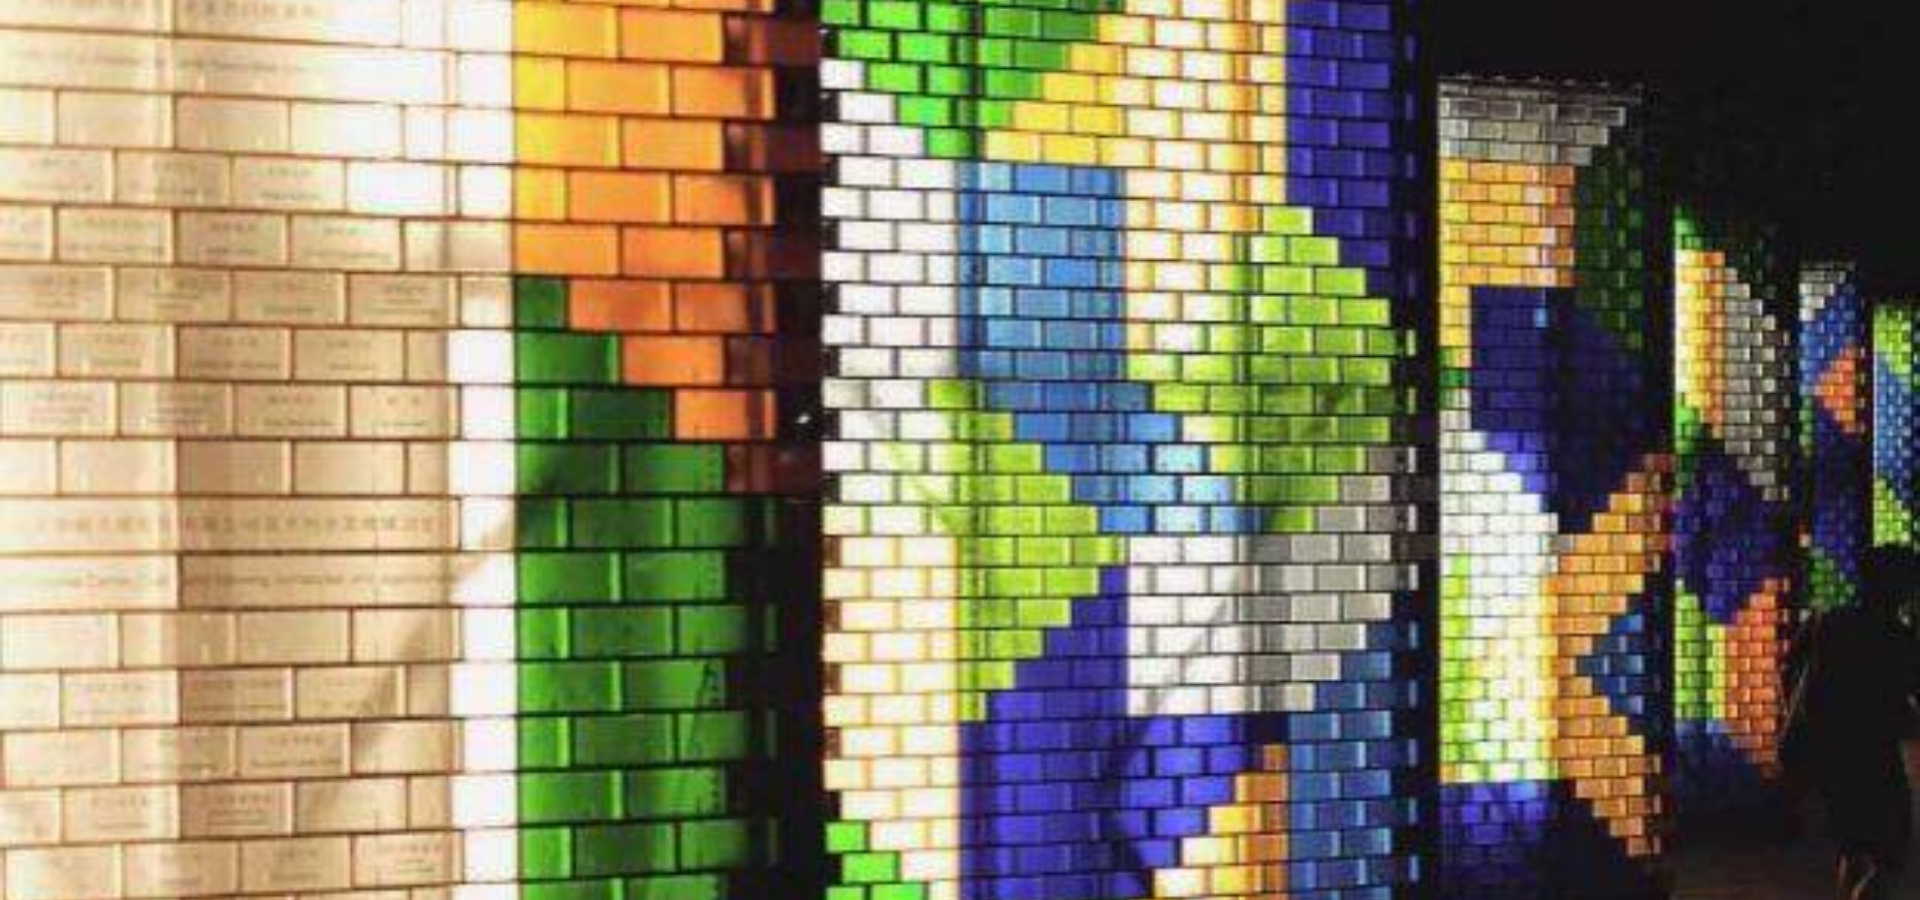 Seven colors glass solid bricks wall